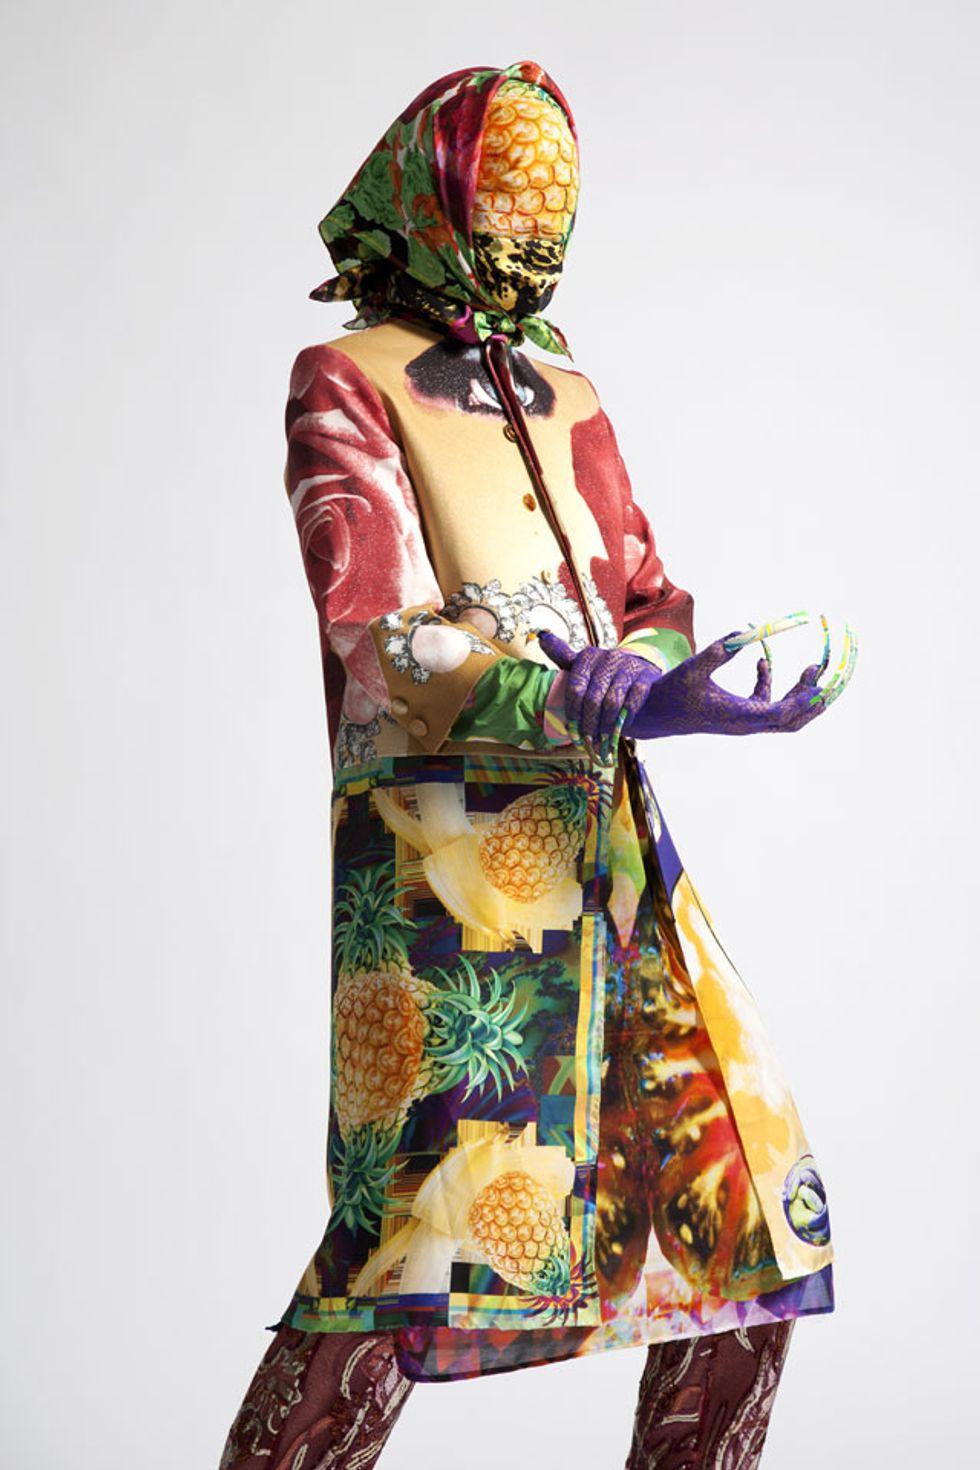 Designer Manon Kündig Shows Us What a Swiss-YouTube-S&M Fashion Mash-Up Looks Like